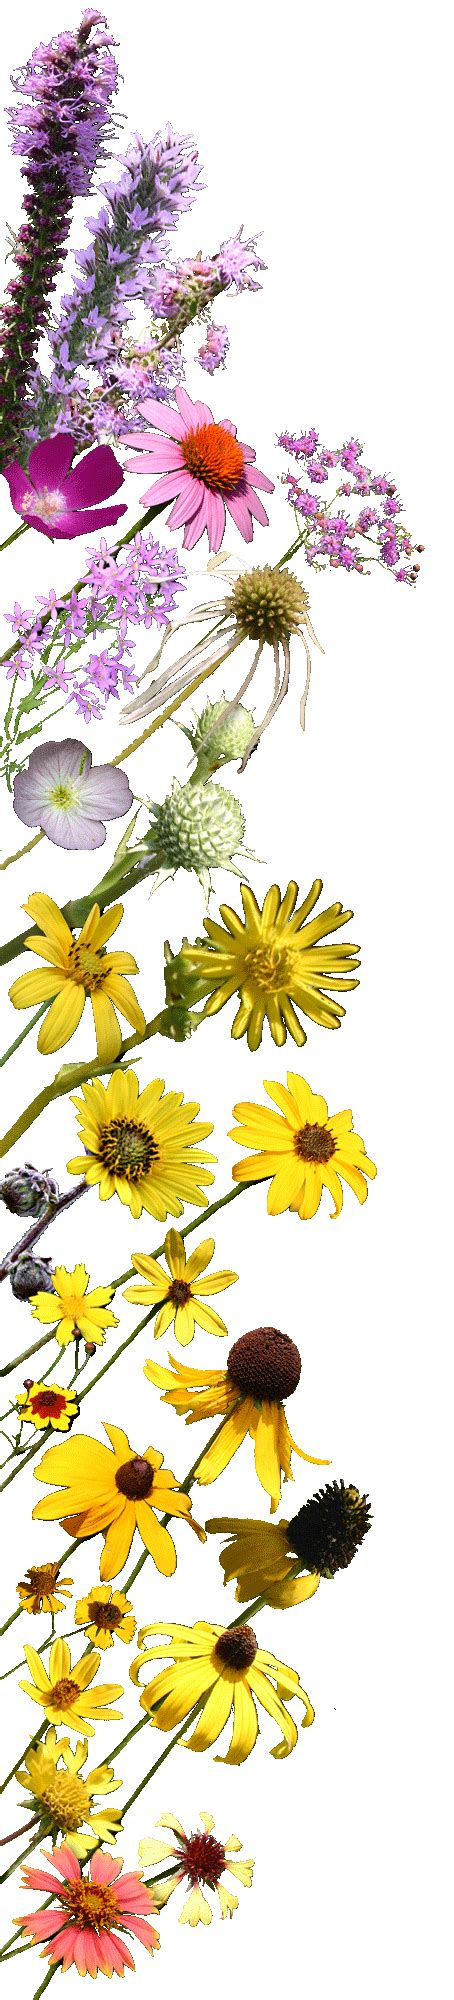 wildflowers north louisiana species